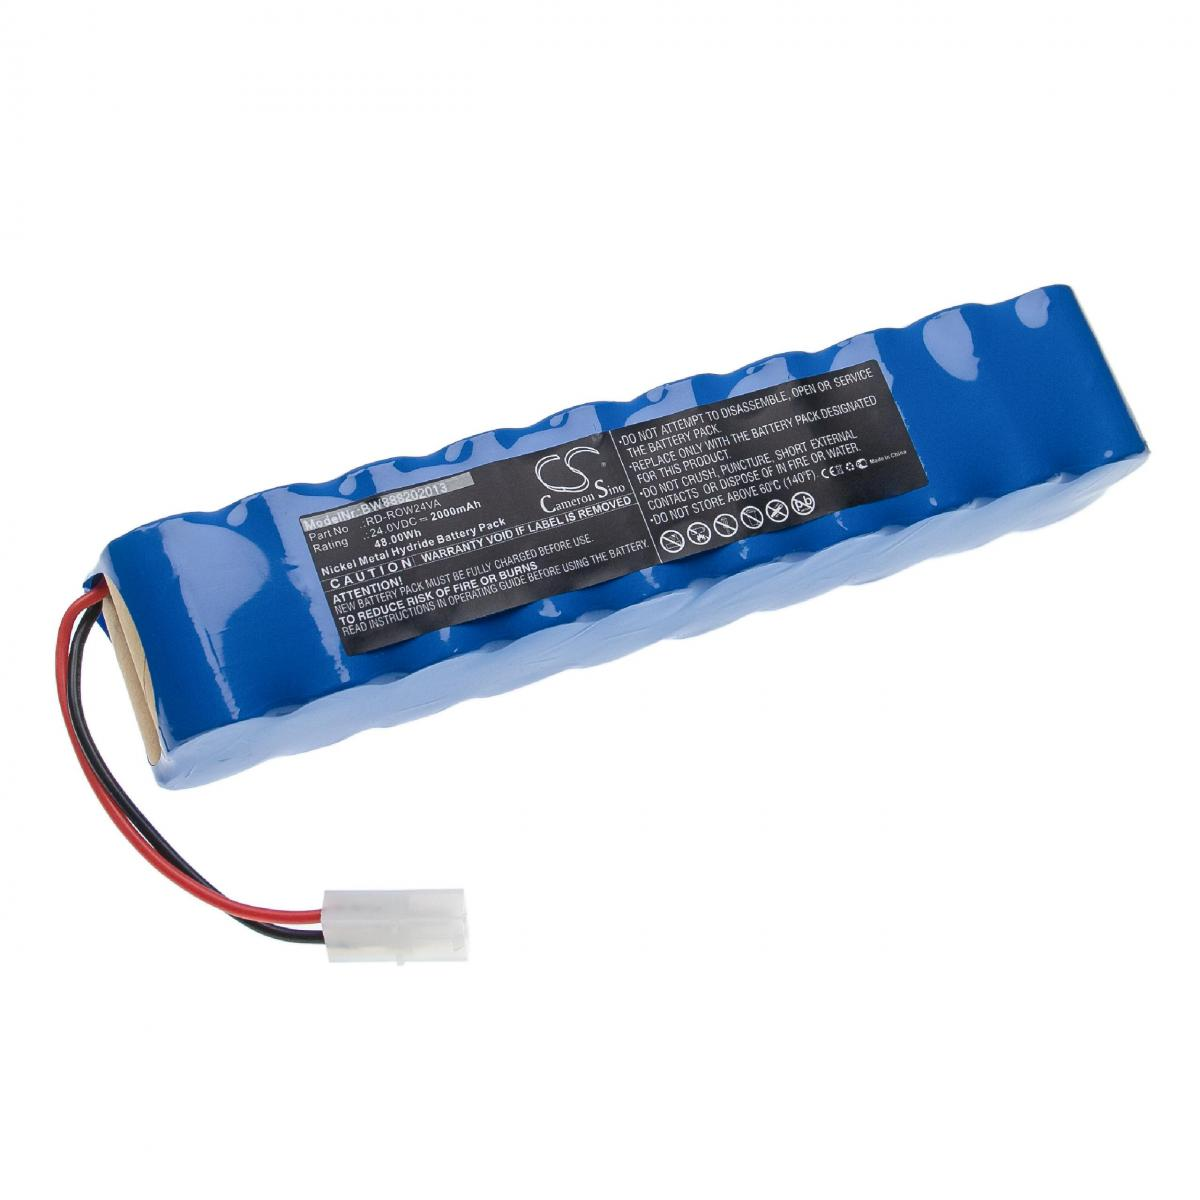 Vhbw vhbw batterie compatible avec Rowenta Air Force Extreme RH8828, RH8828WO/2D0 aspirateur Home Cleaner (2000mAh, 24V, NiMH